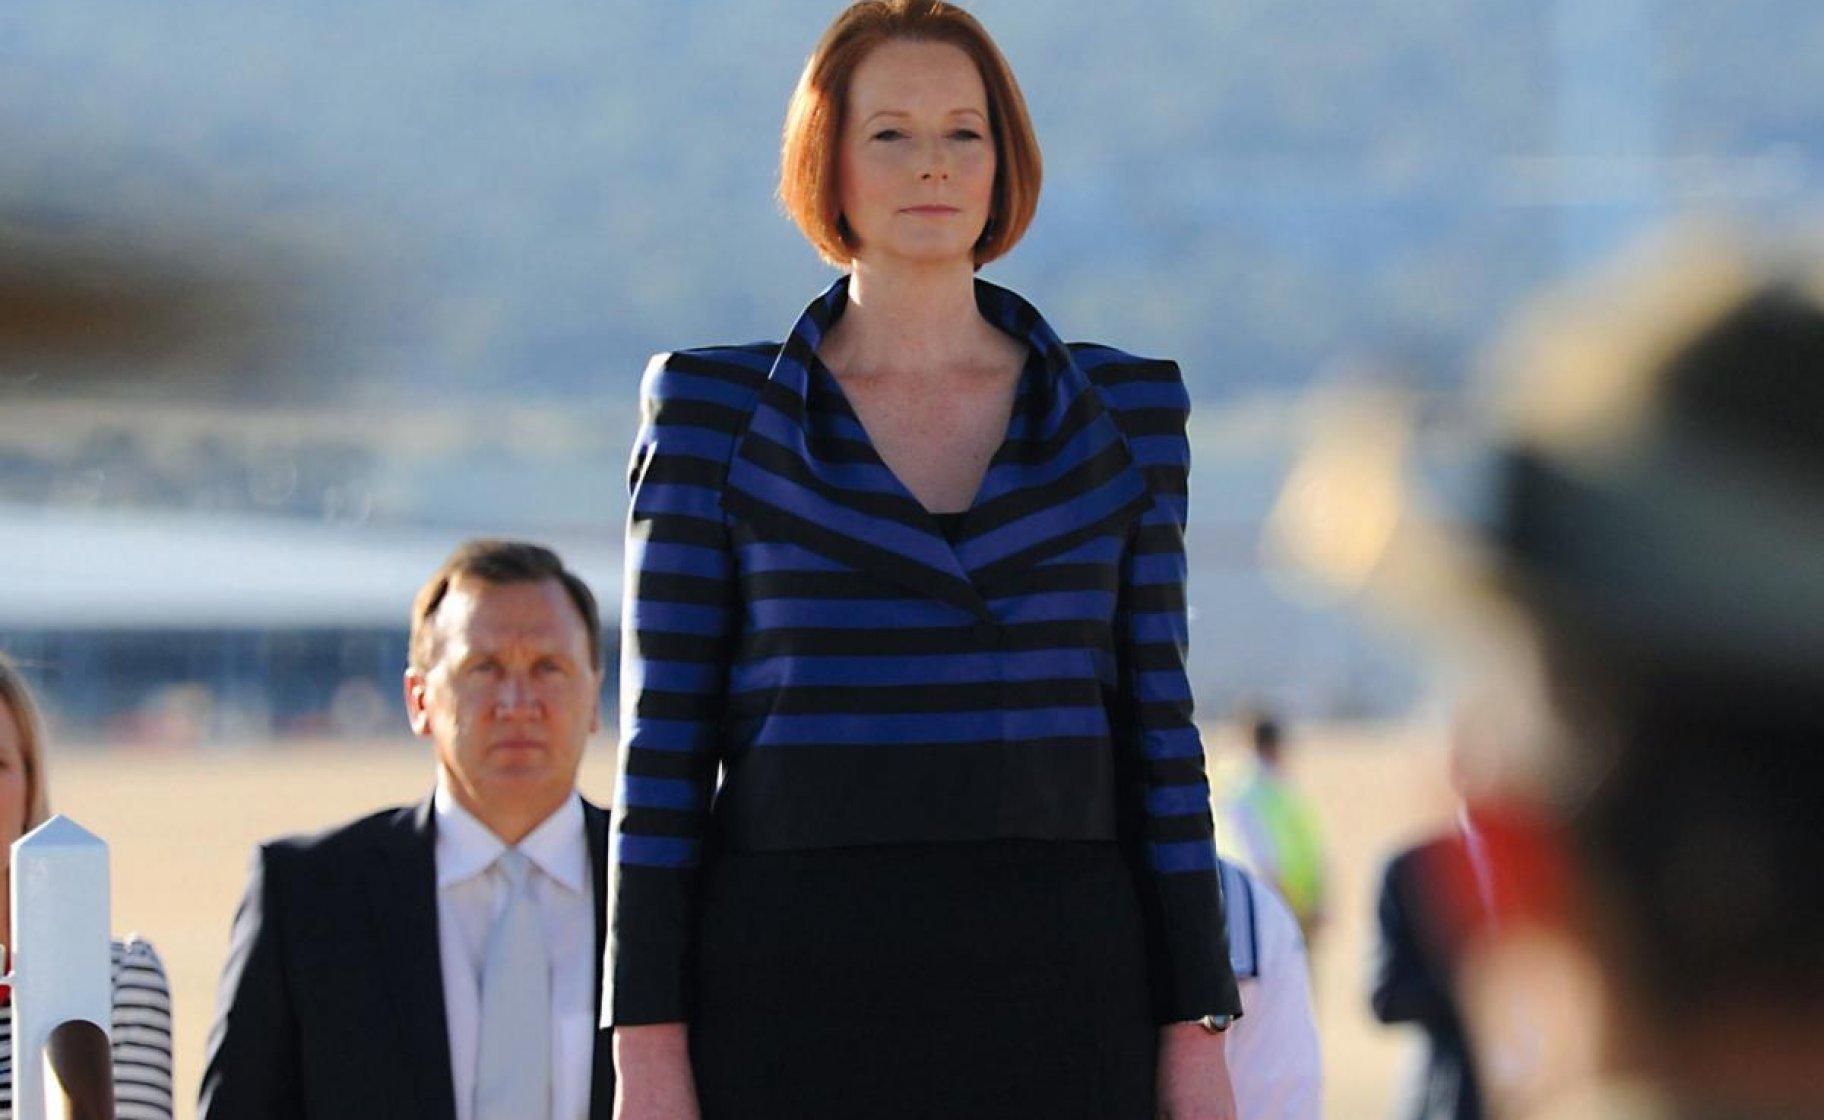 Julia Gillard, Canberra, October 2011. © Commonwealth of Australia